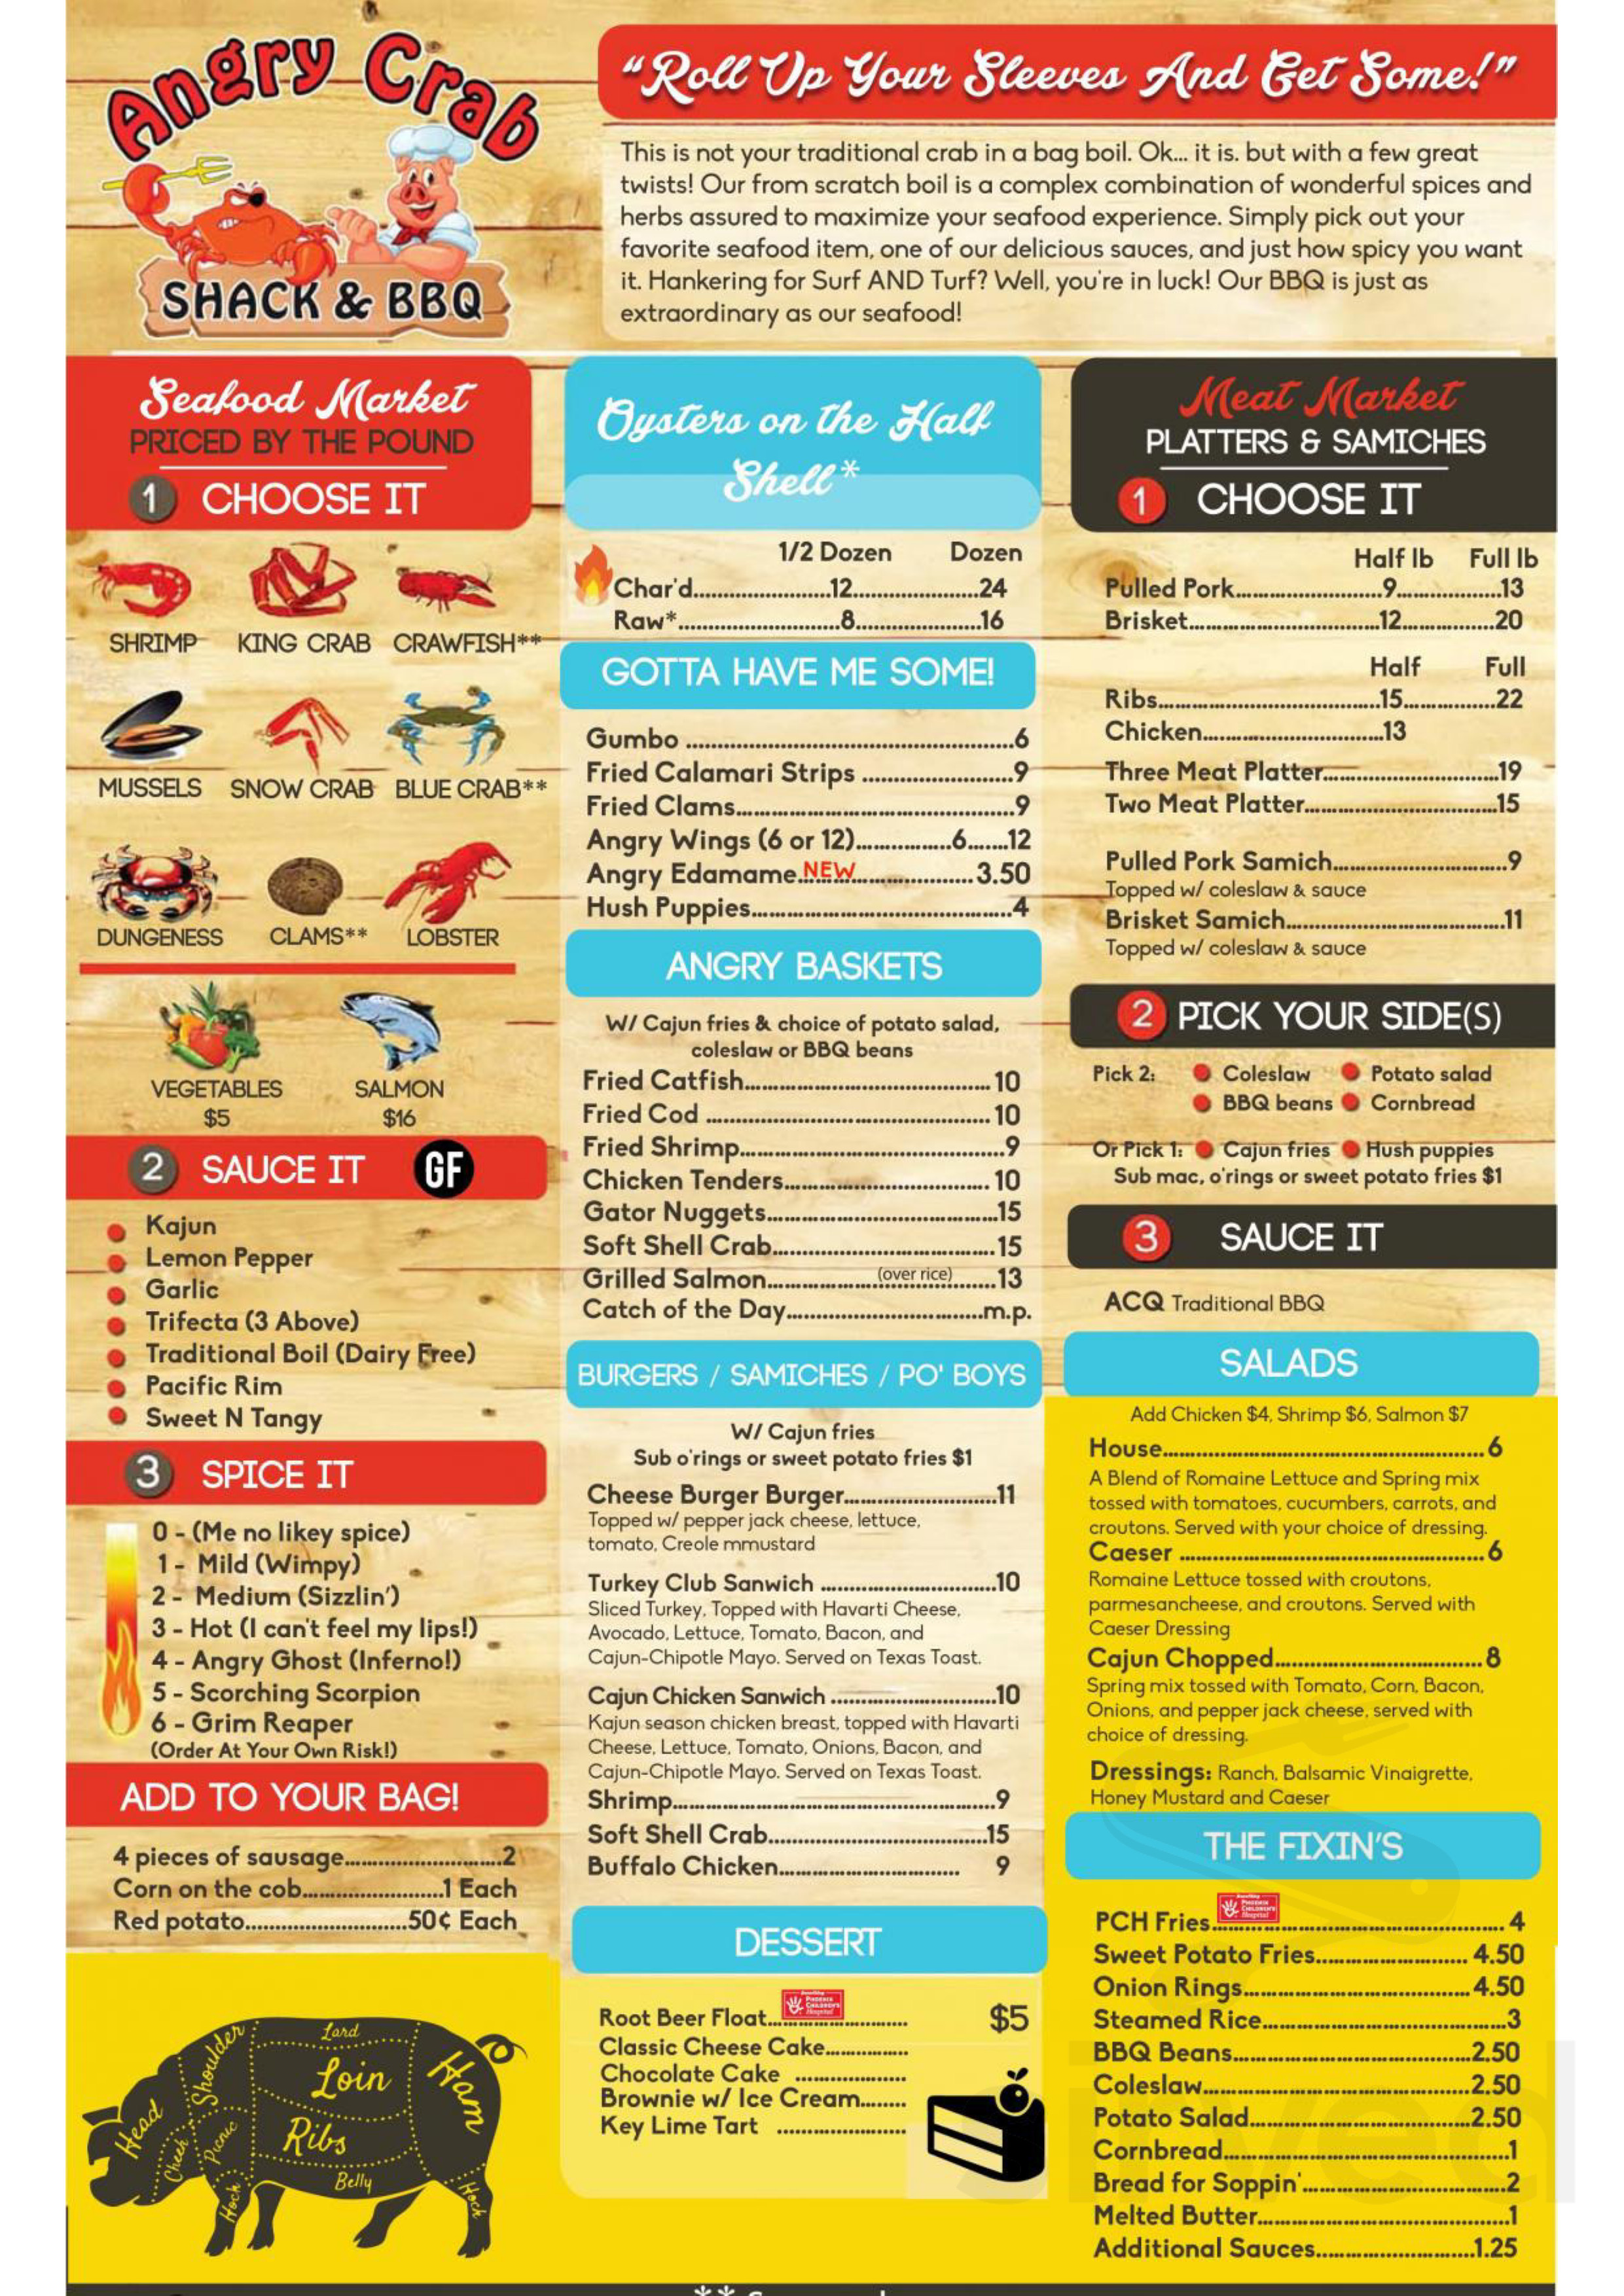 Menu For Angry Crab Shack Bbq In Tucson Arizona Usa